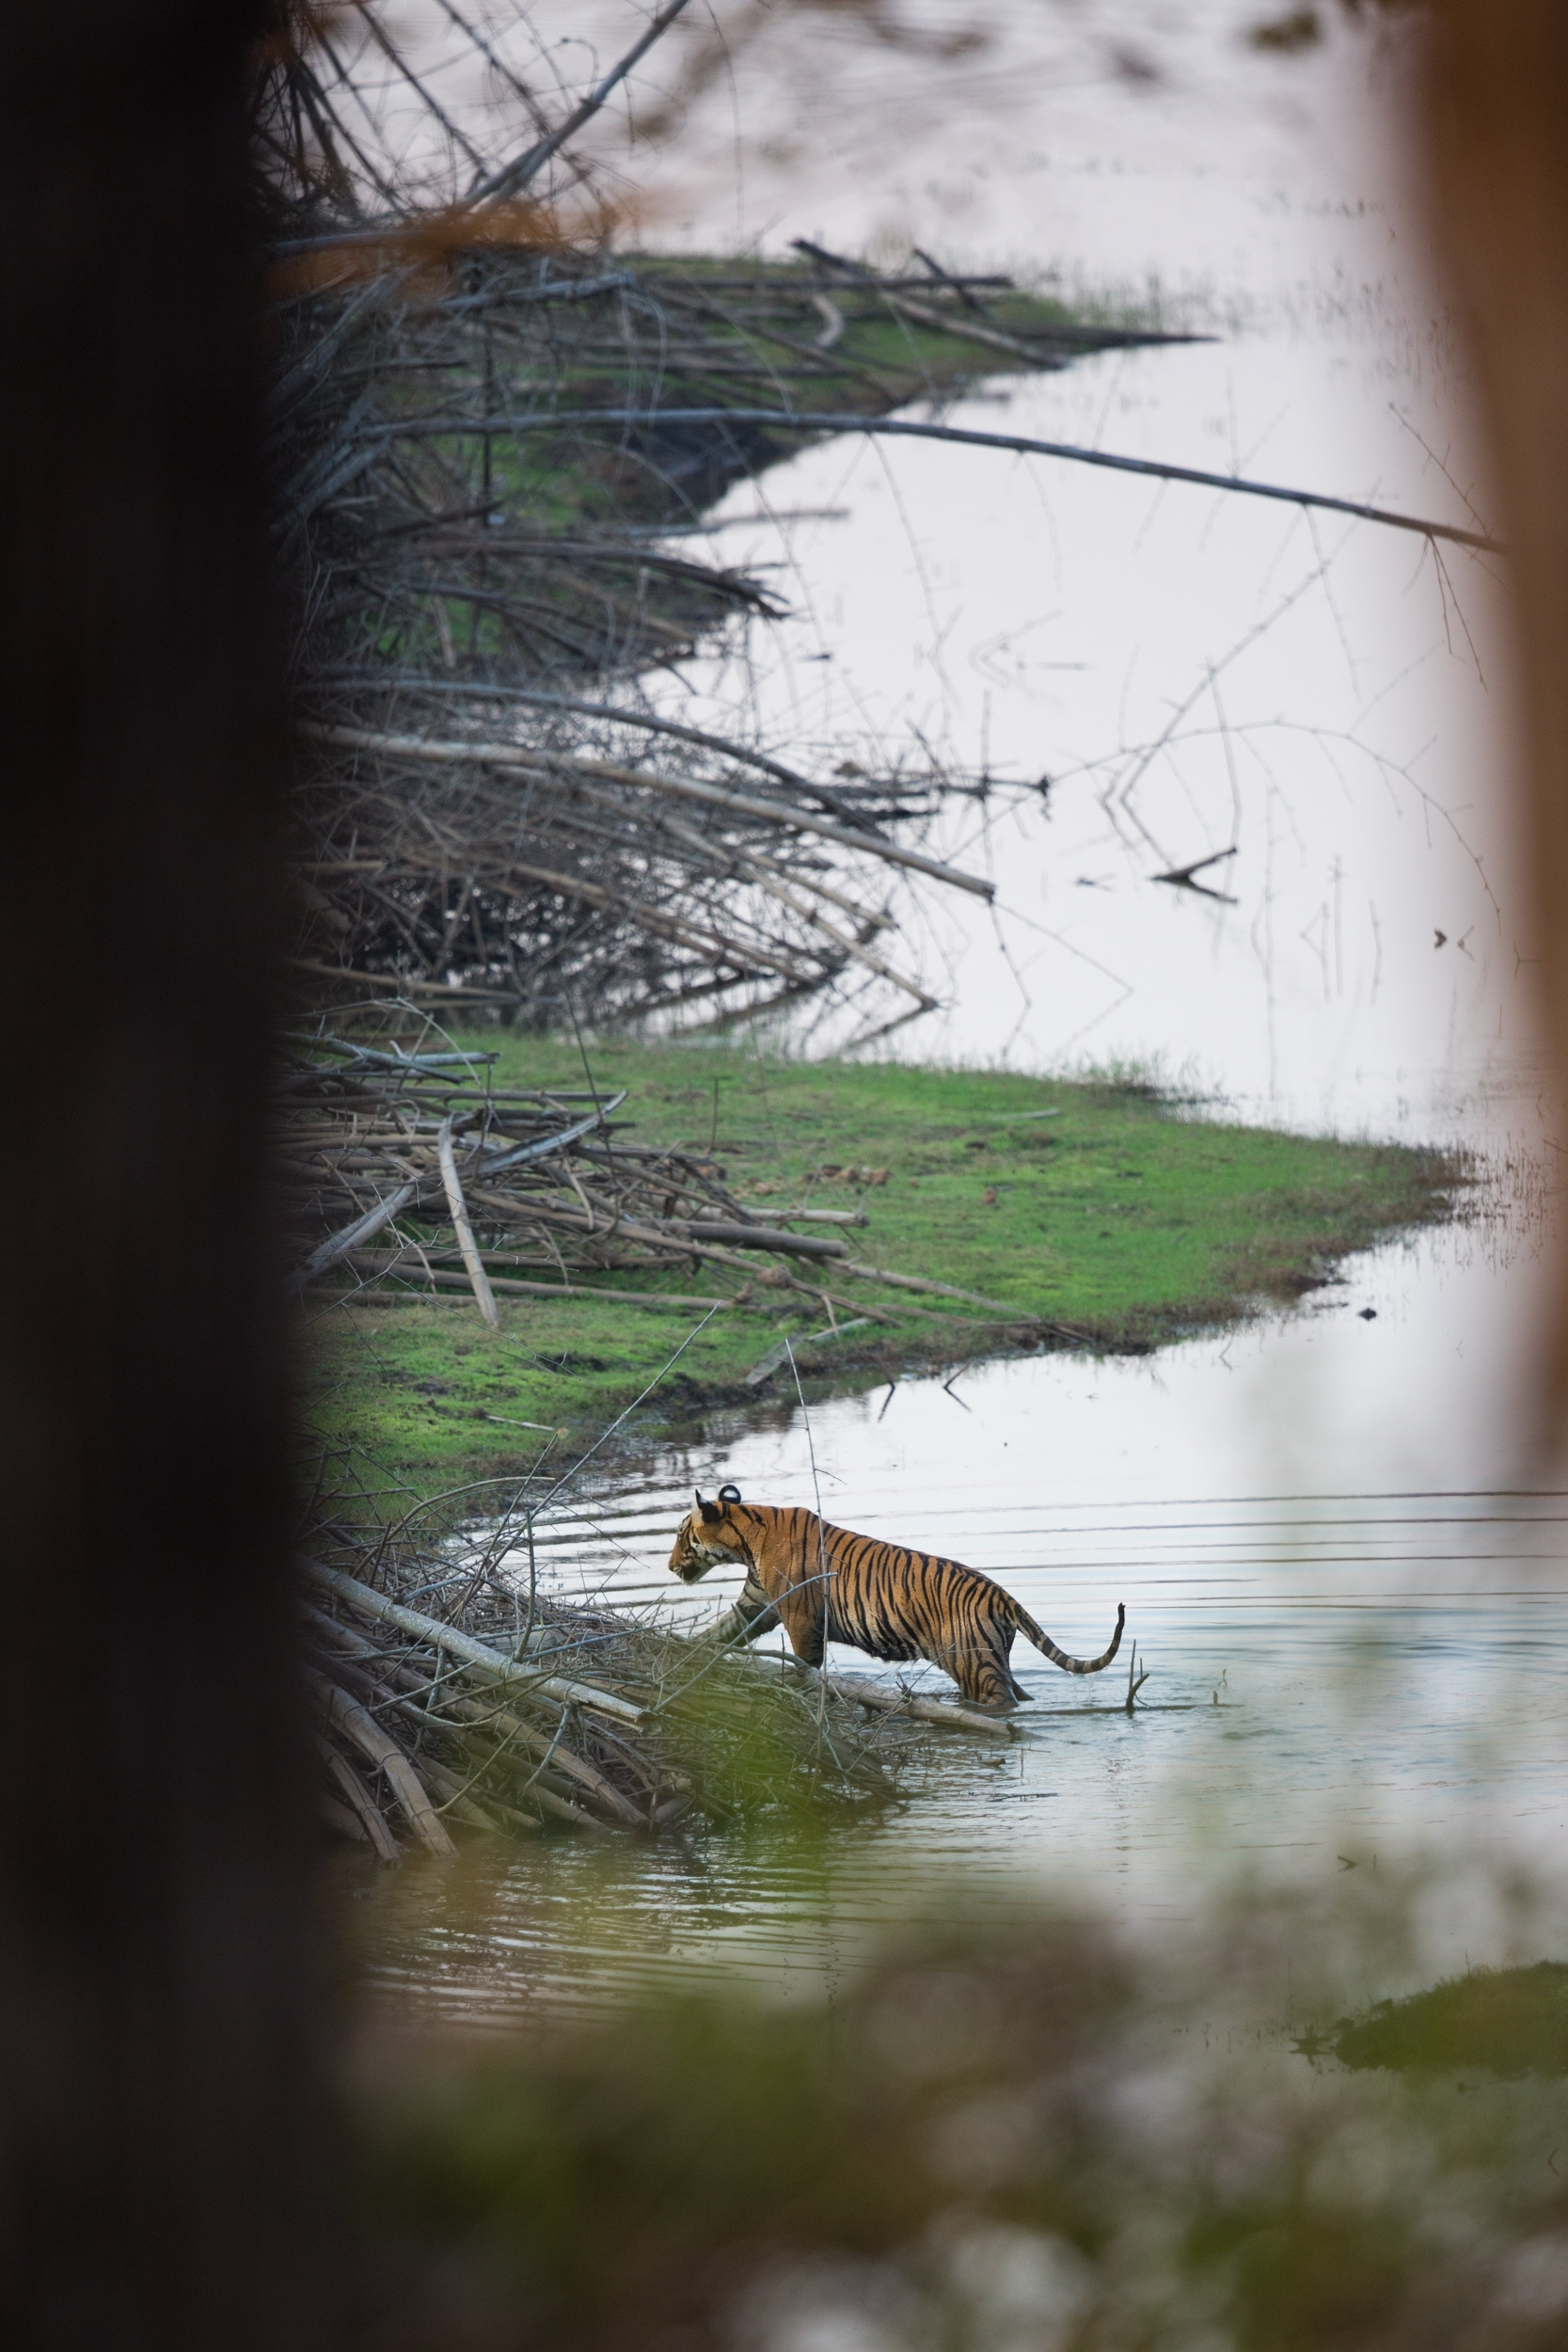 Tiger at Kabini.